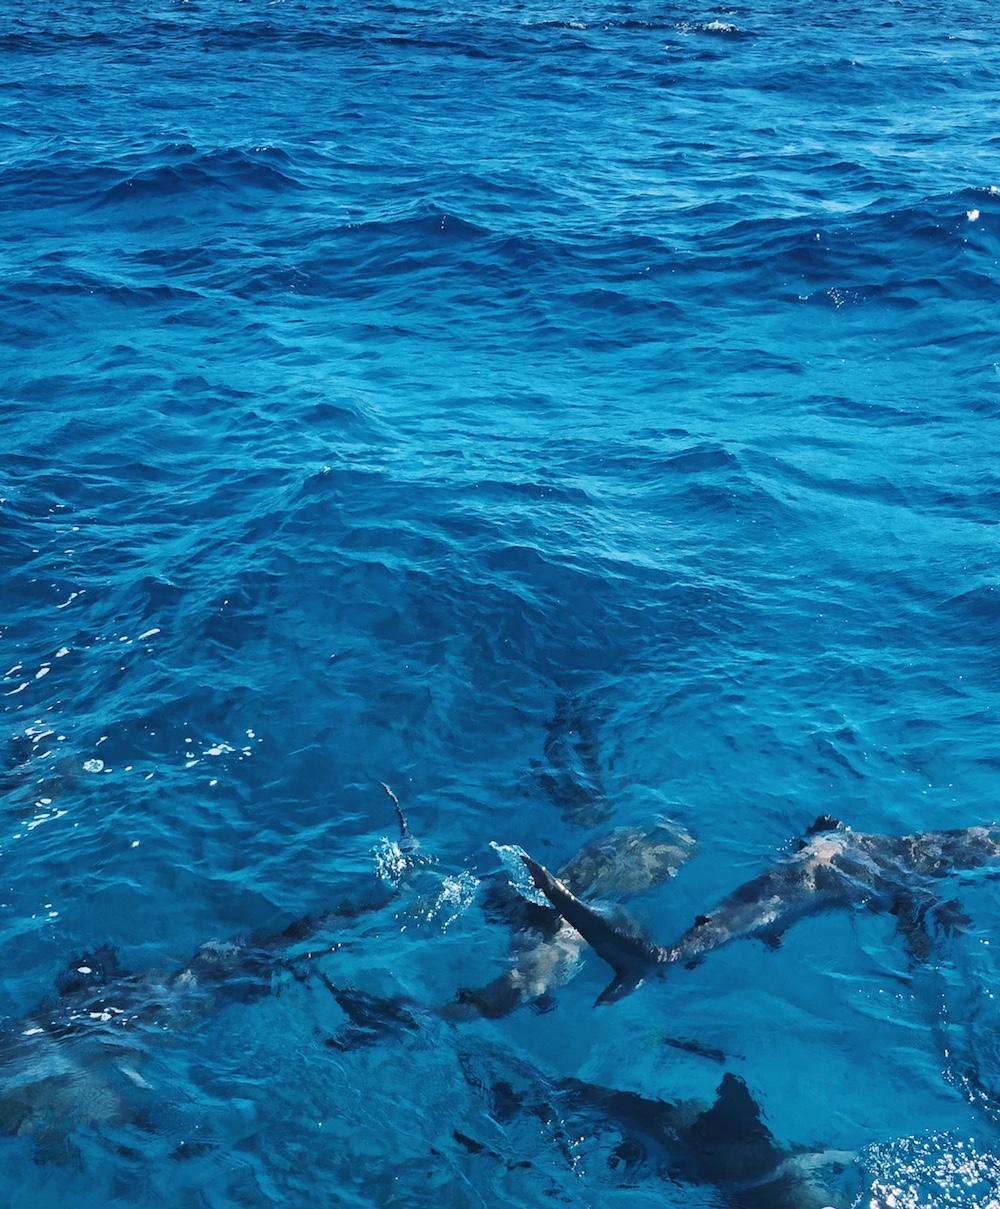 Stuart Cove snorkel excursion Bahamas reef sharks